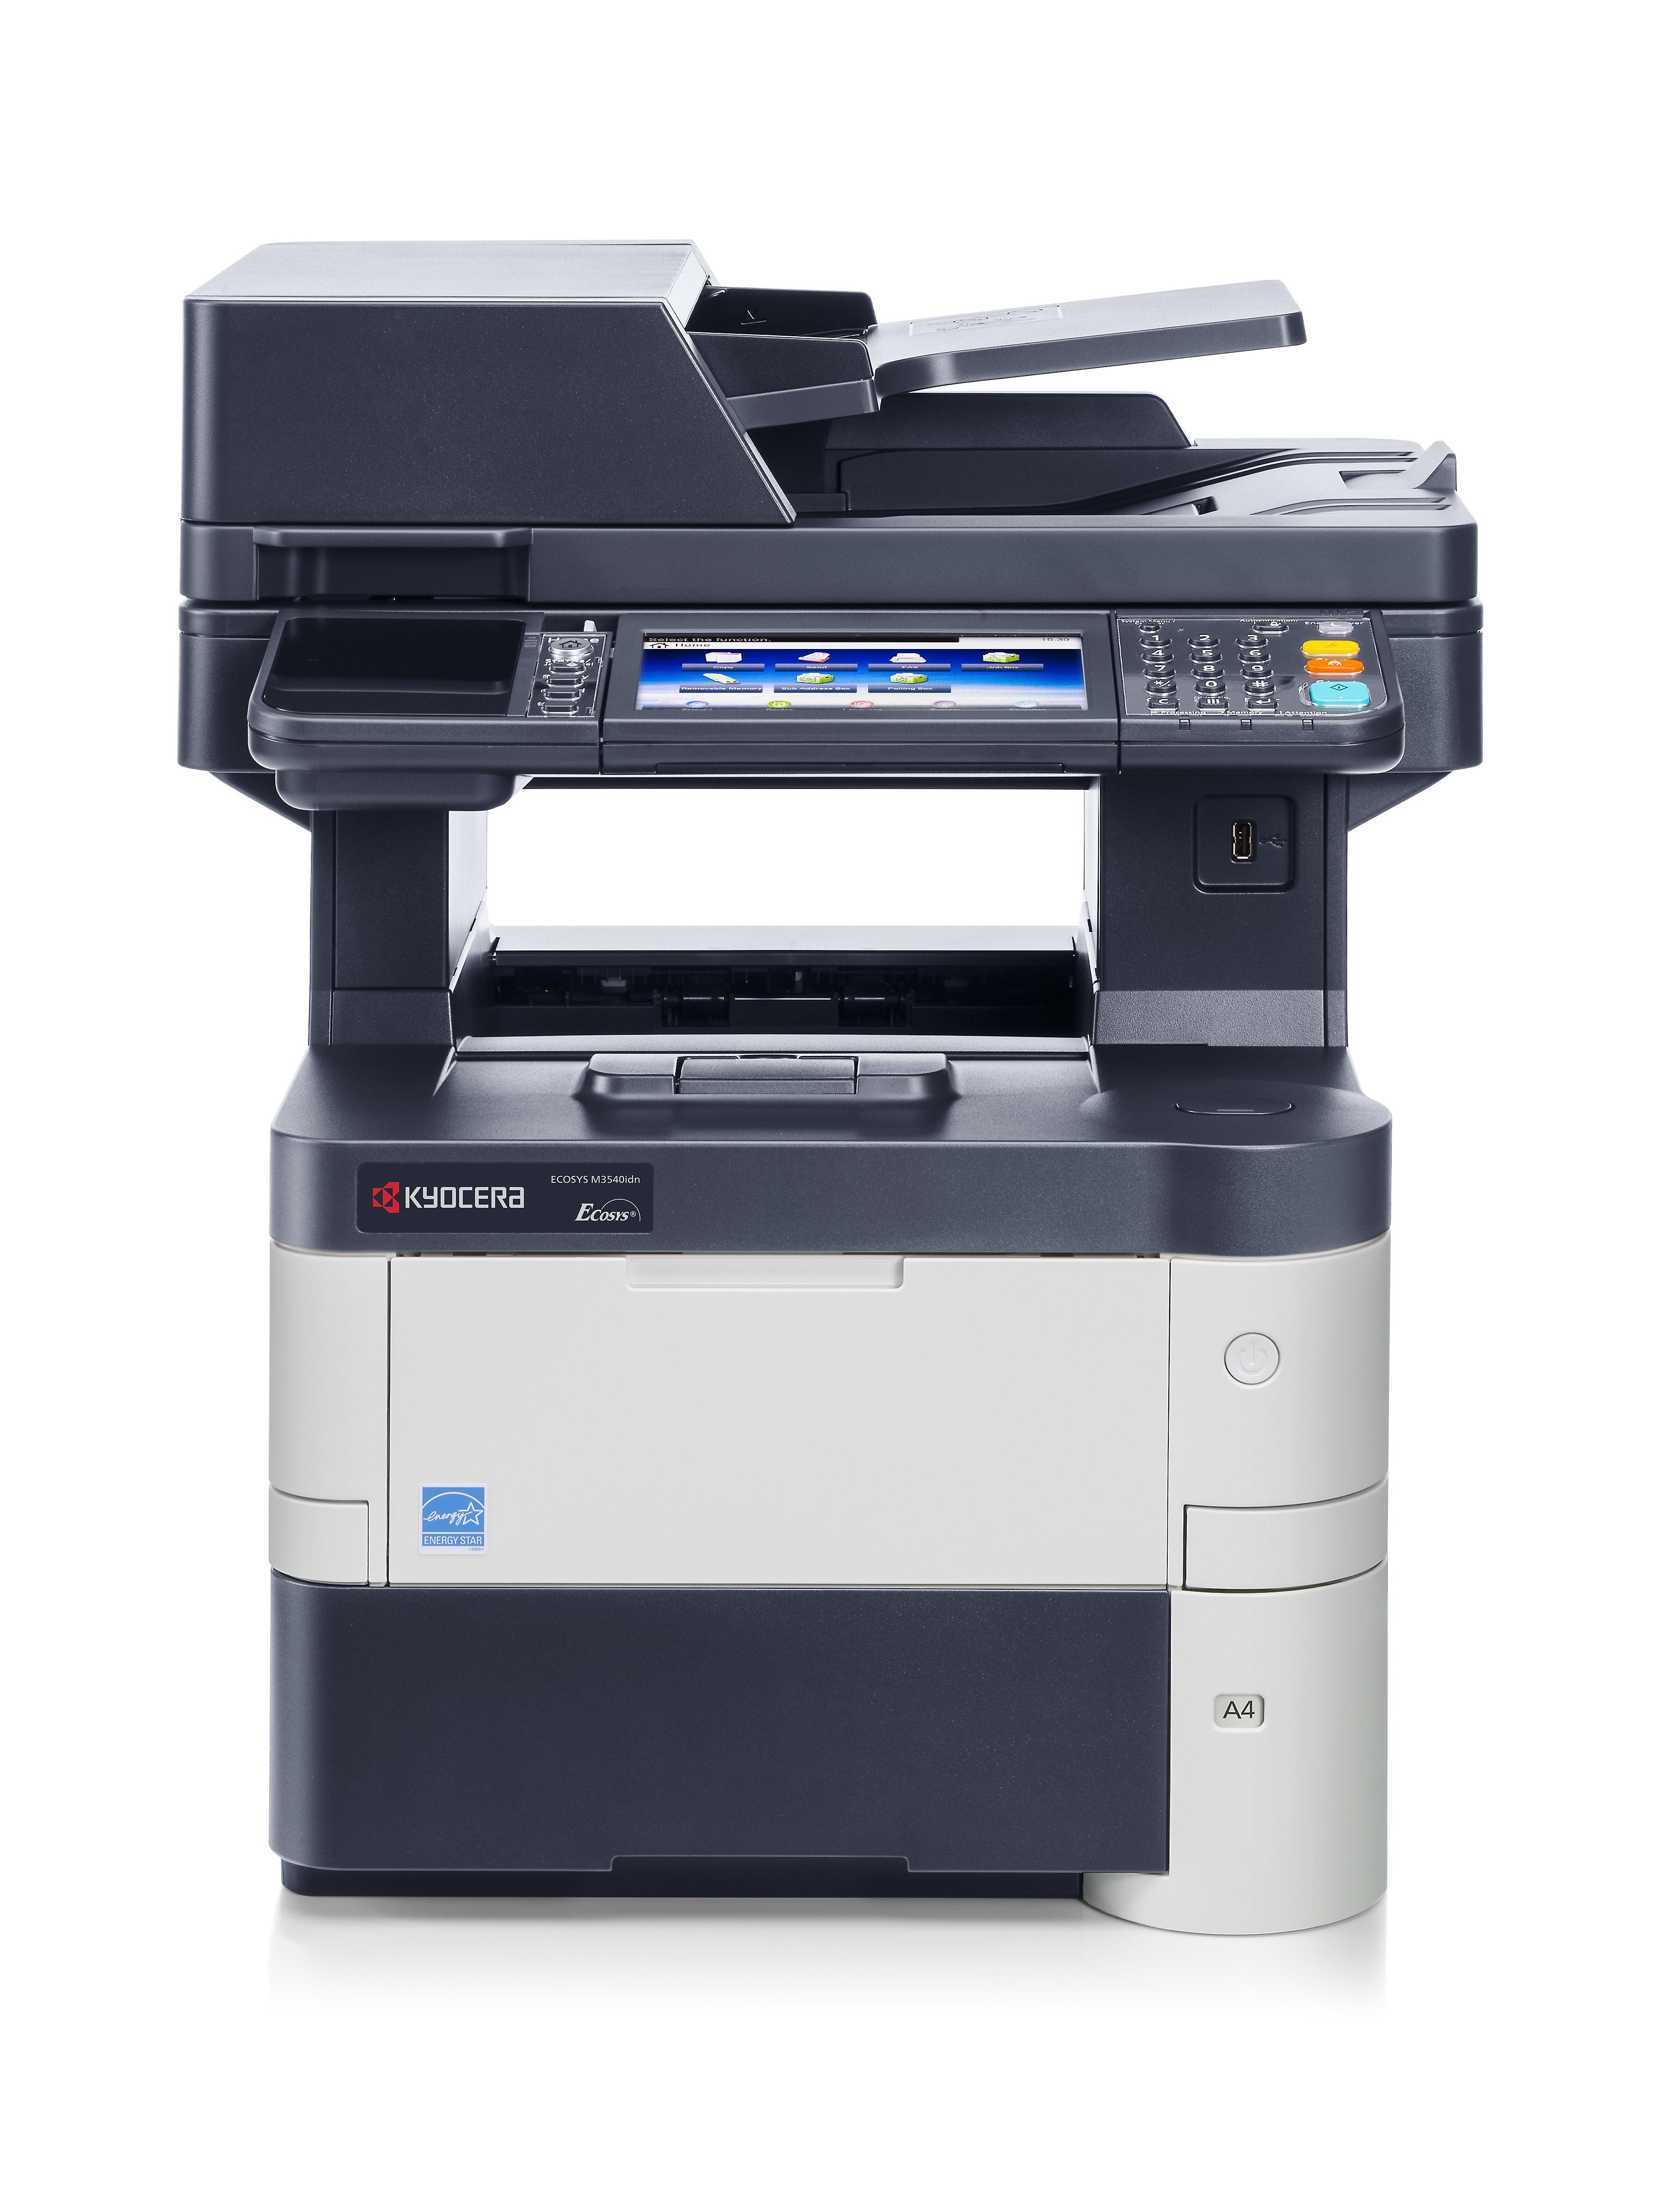 Kyocera ECOSYS M3540idn/KL3 - Multifunktionsdrucker - s/w